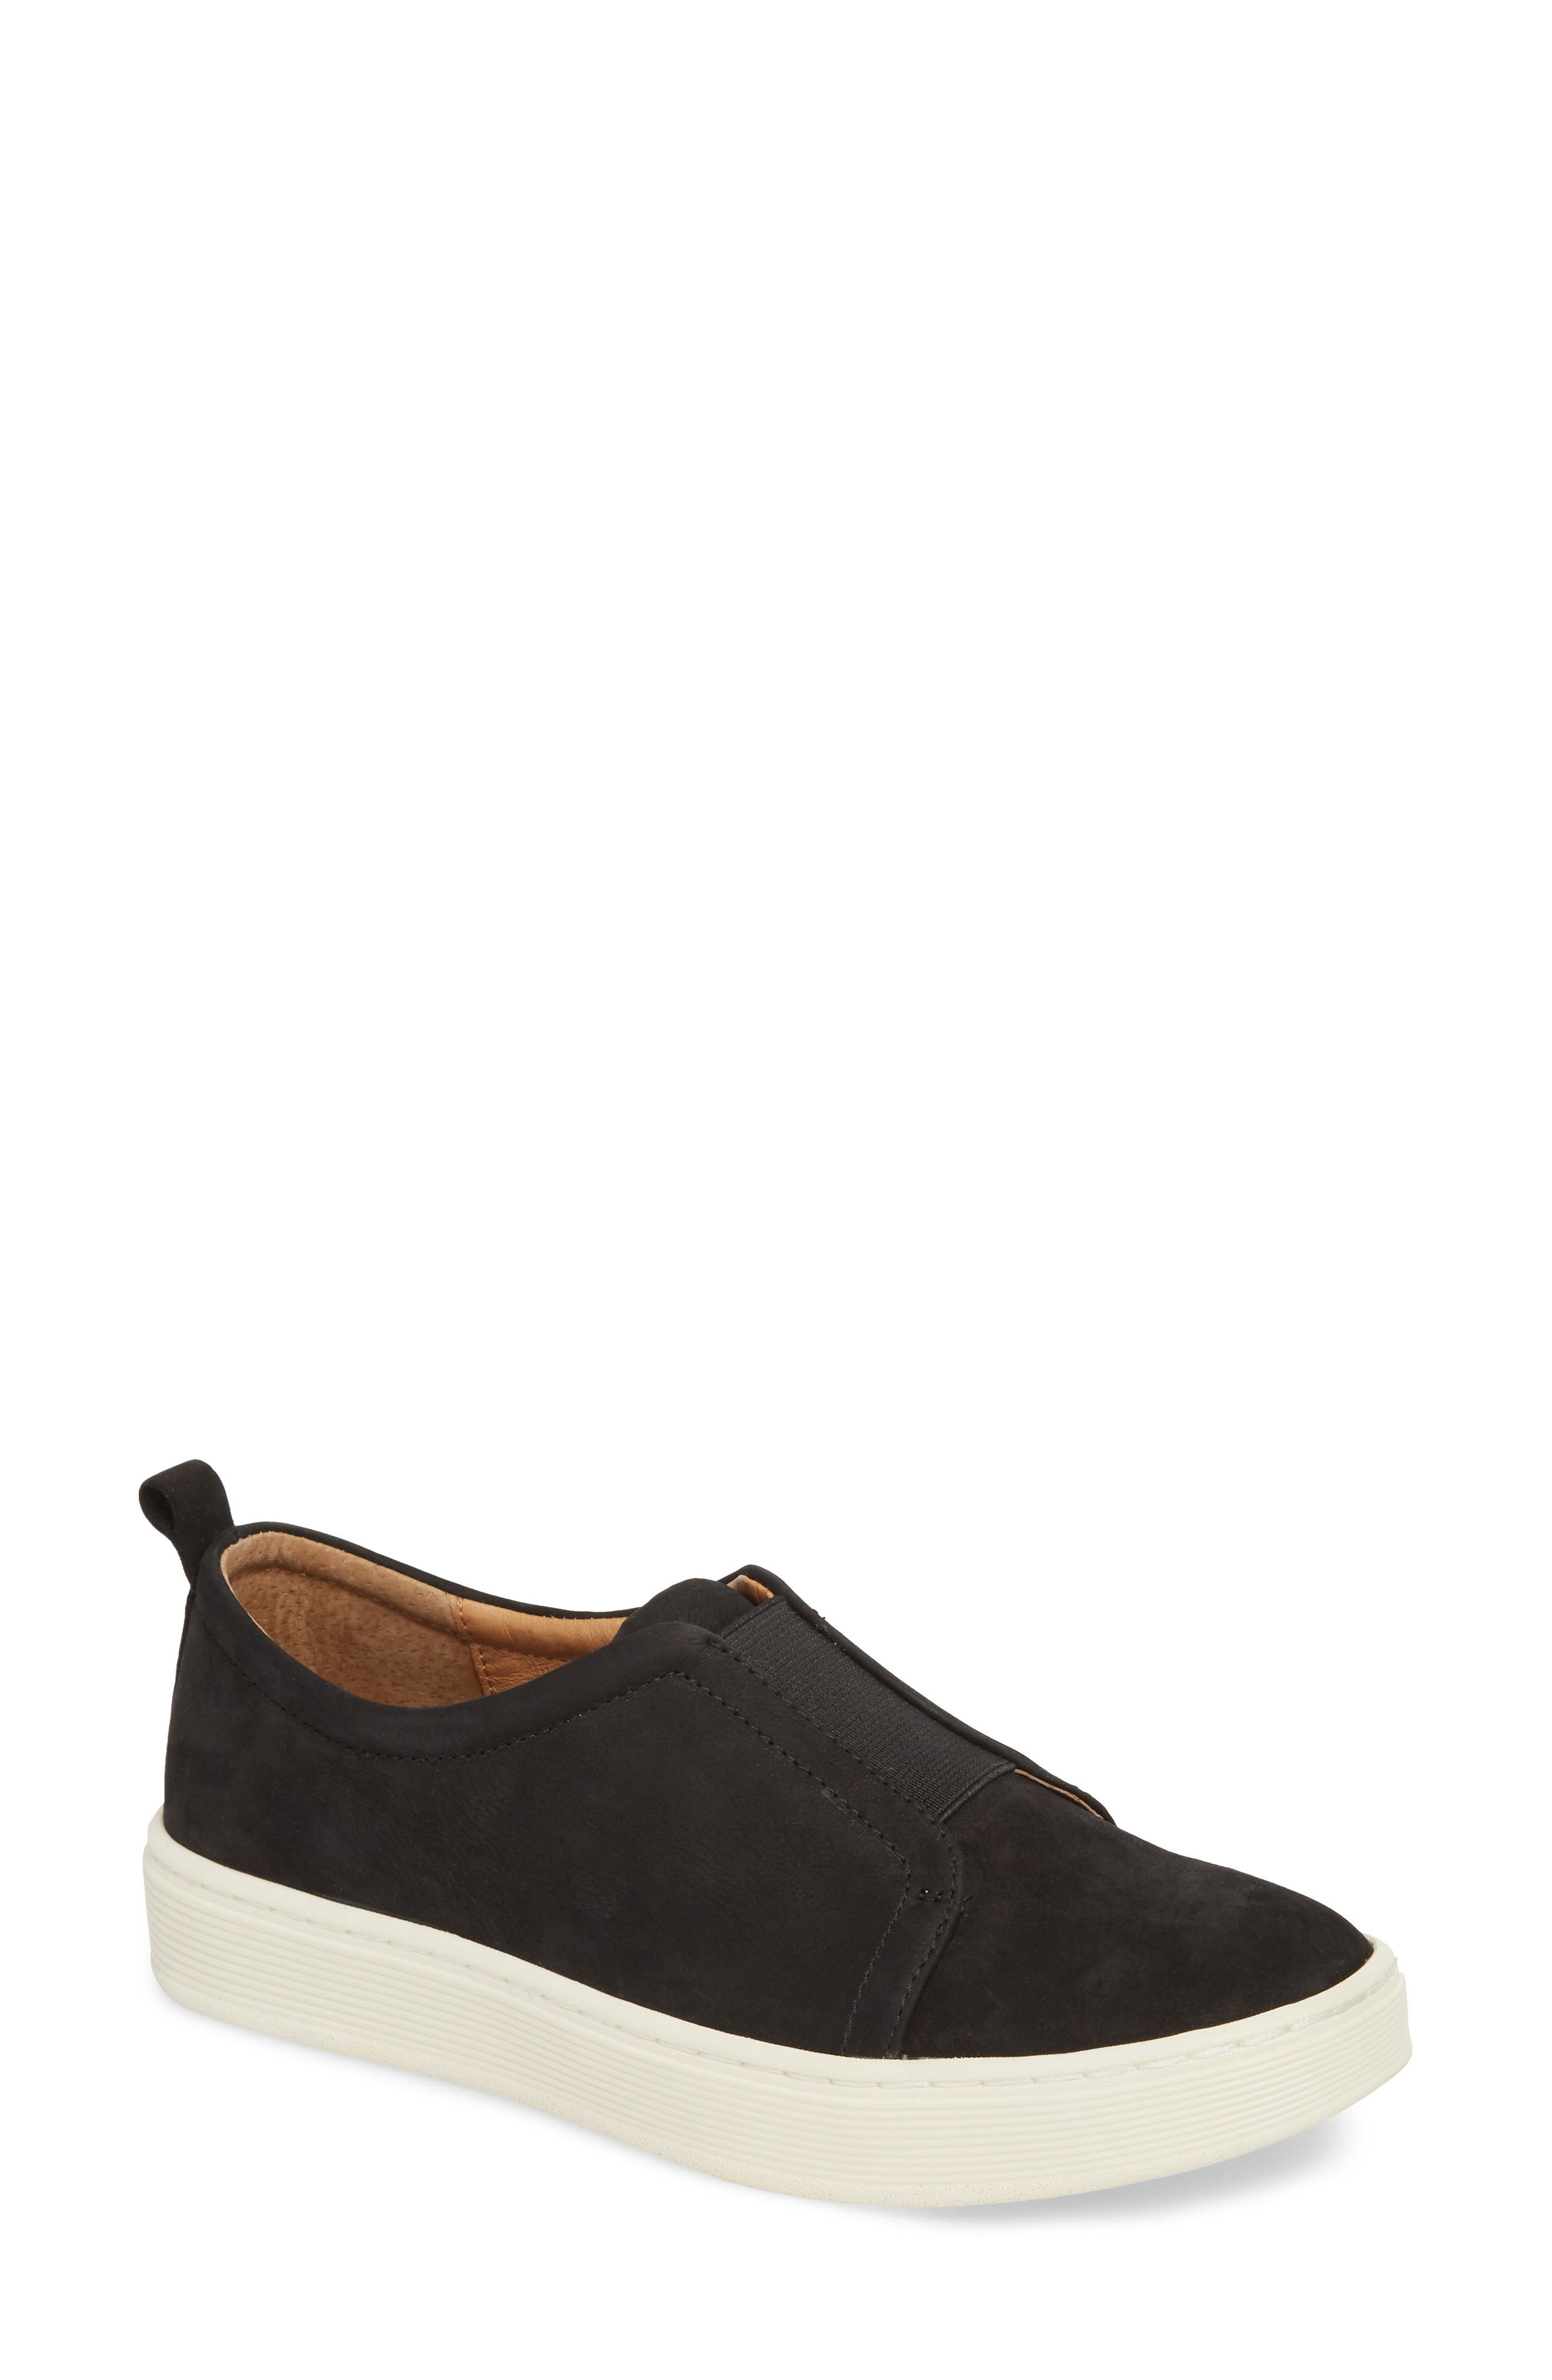 Safia Slip-On Sneaker,                             Main thumbnail 1, color,                             TRUE BLACK LEATHER